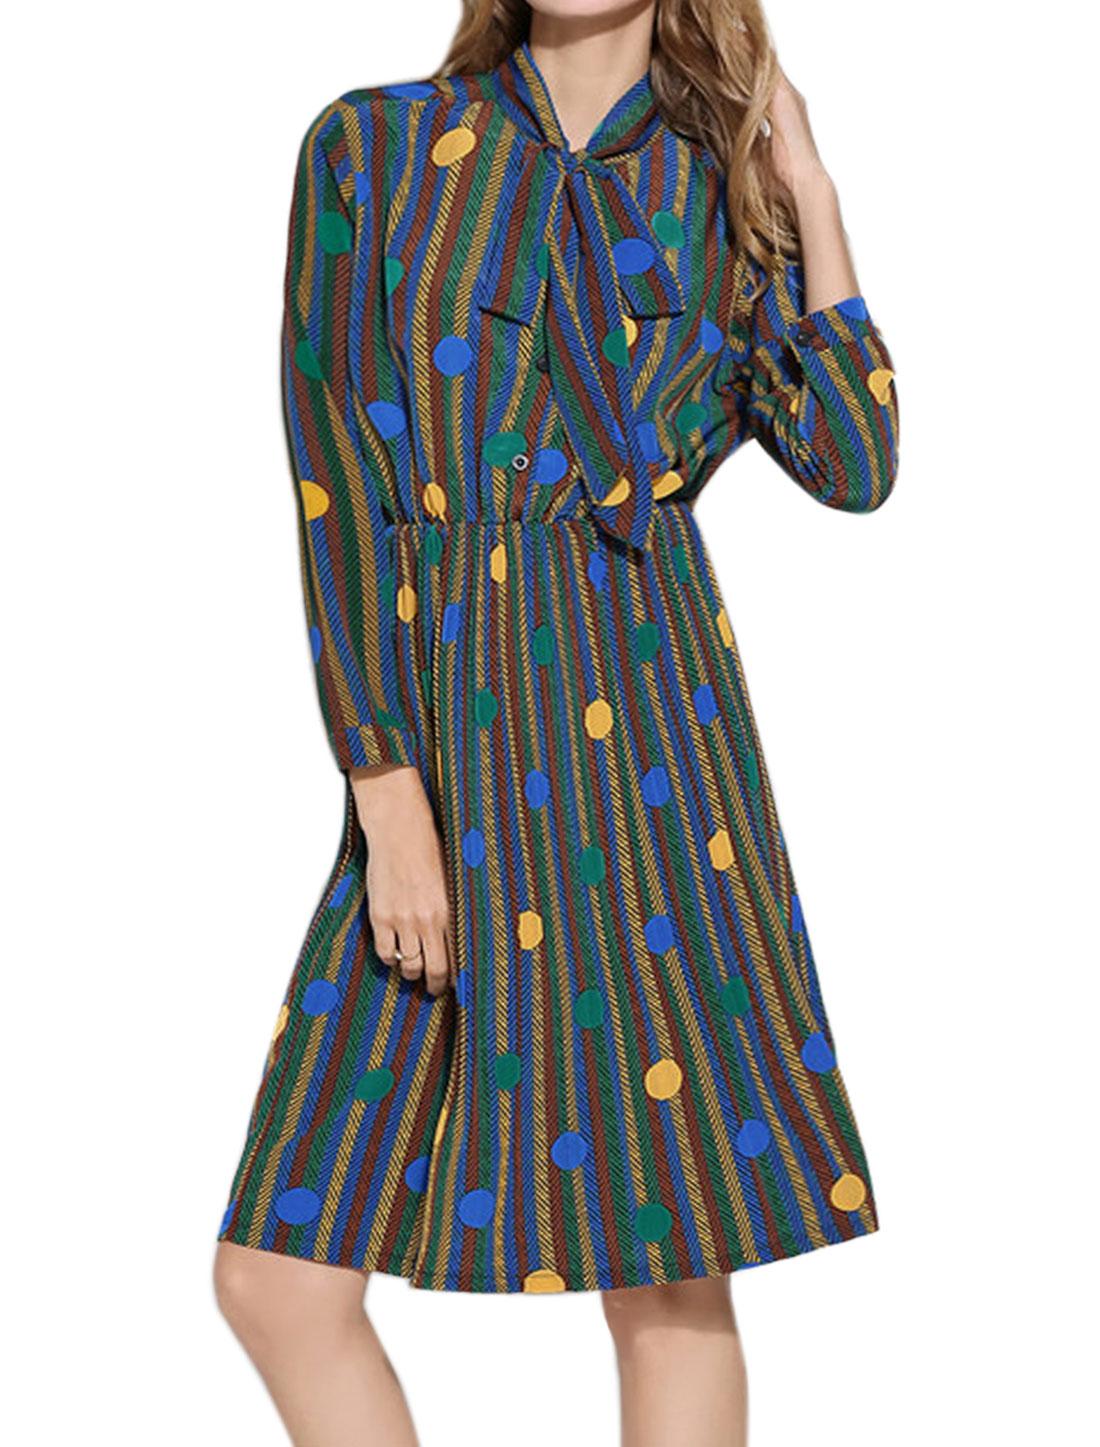 Woman Tie Neck Elastic Waist Polka Dots Stripes Pleated Dress Blue M